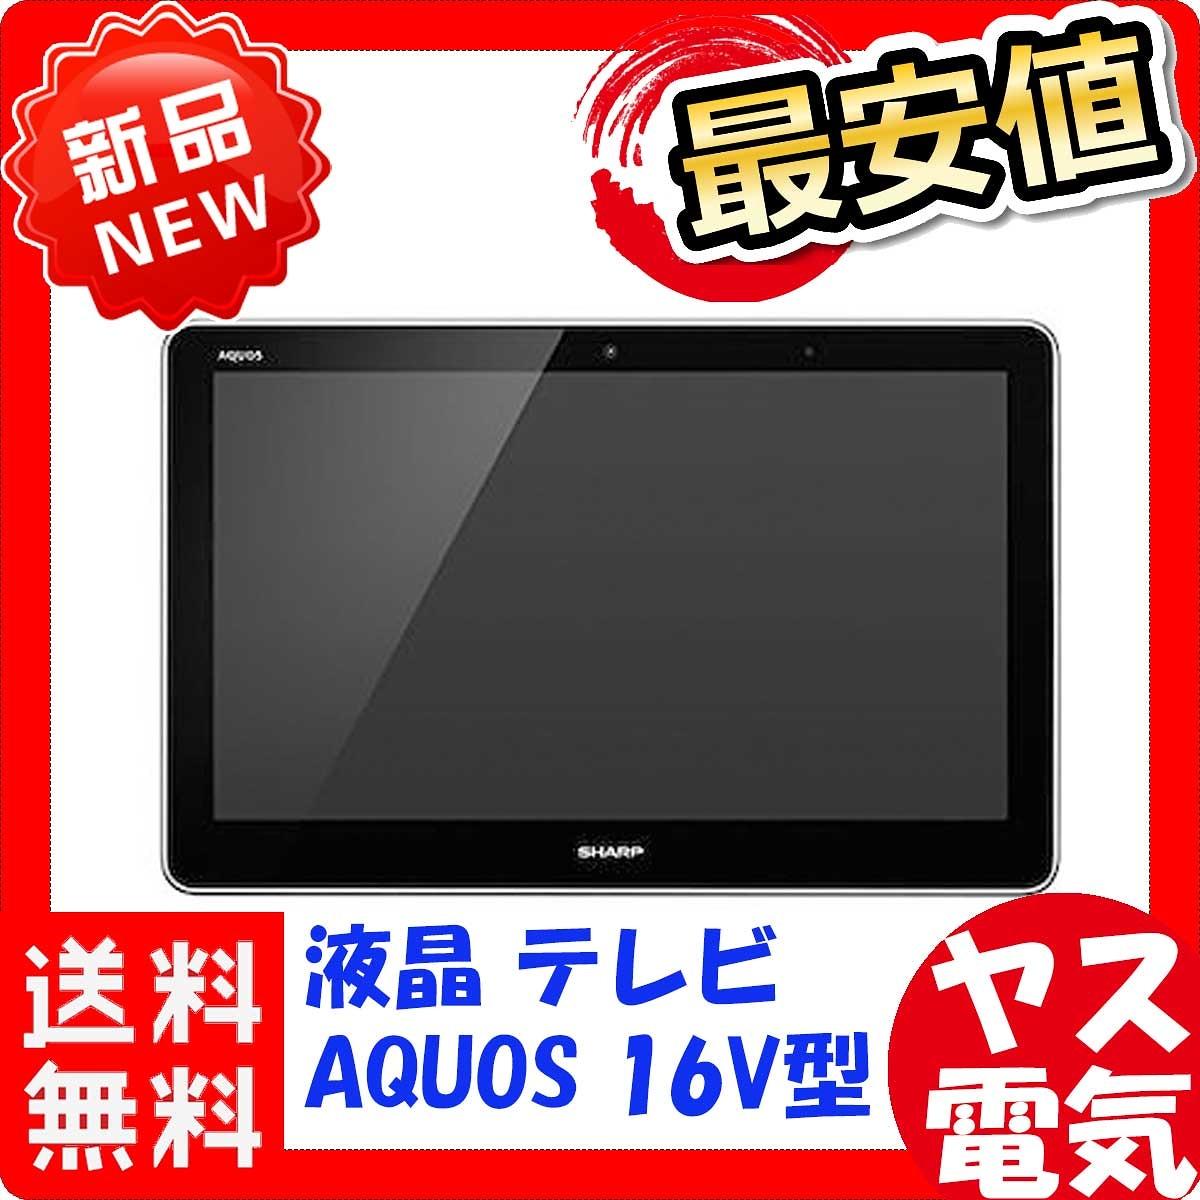 AQUOS ファミレド HC-16TT1 製品画像